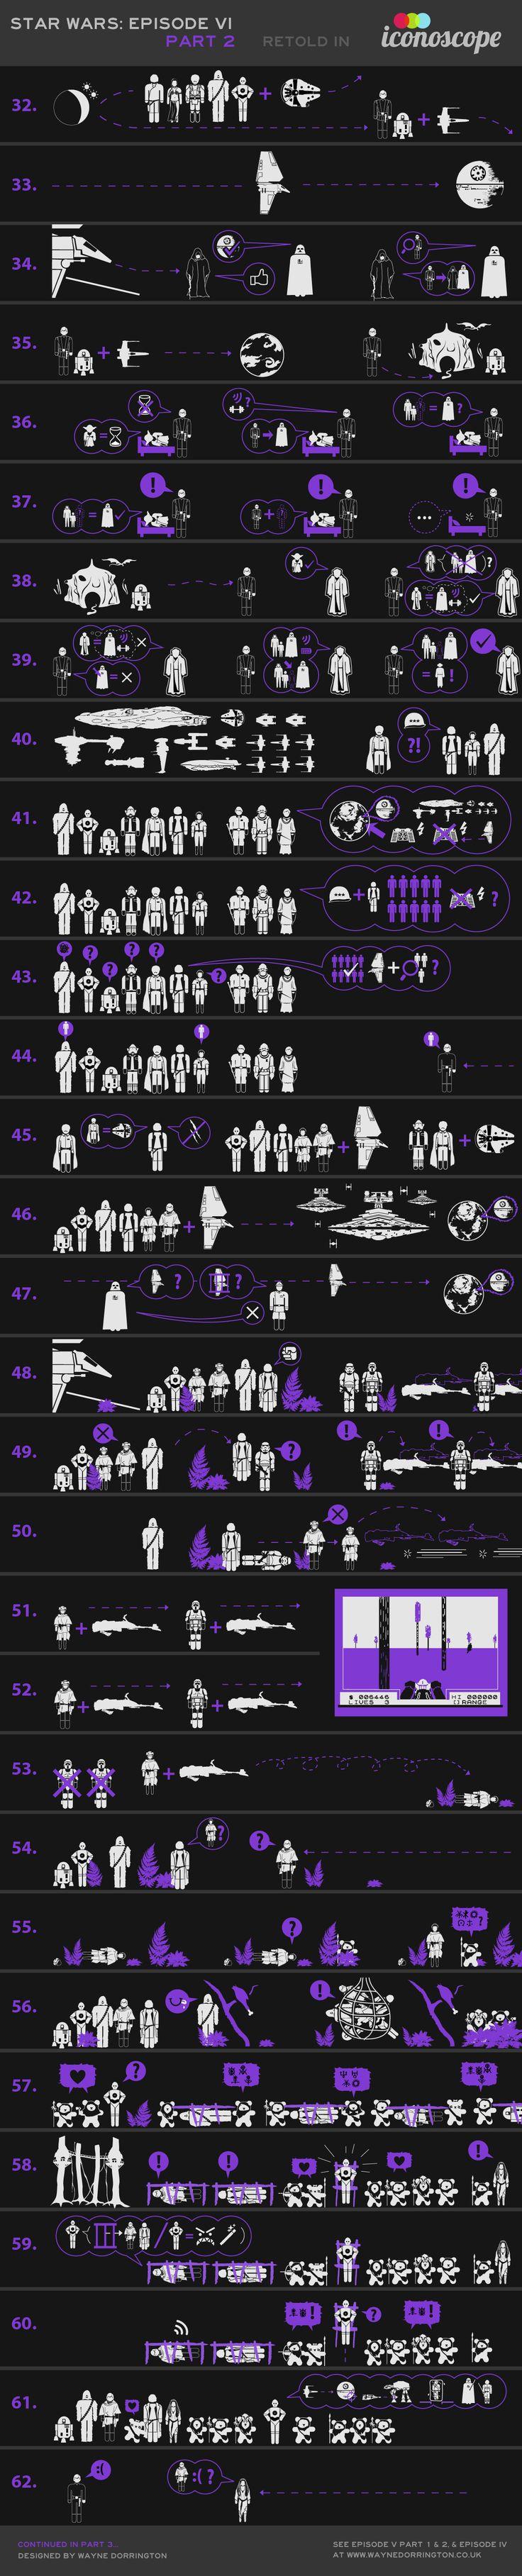 #starwars episode VI (part 2) retold in iconoscope #fanart